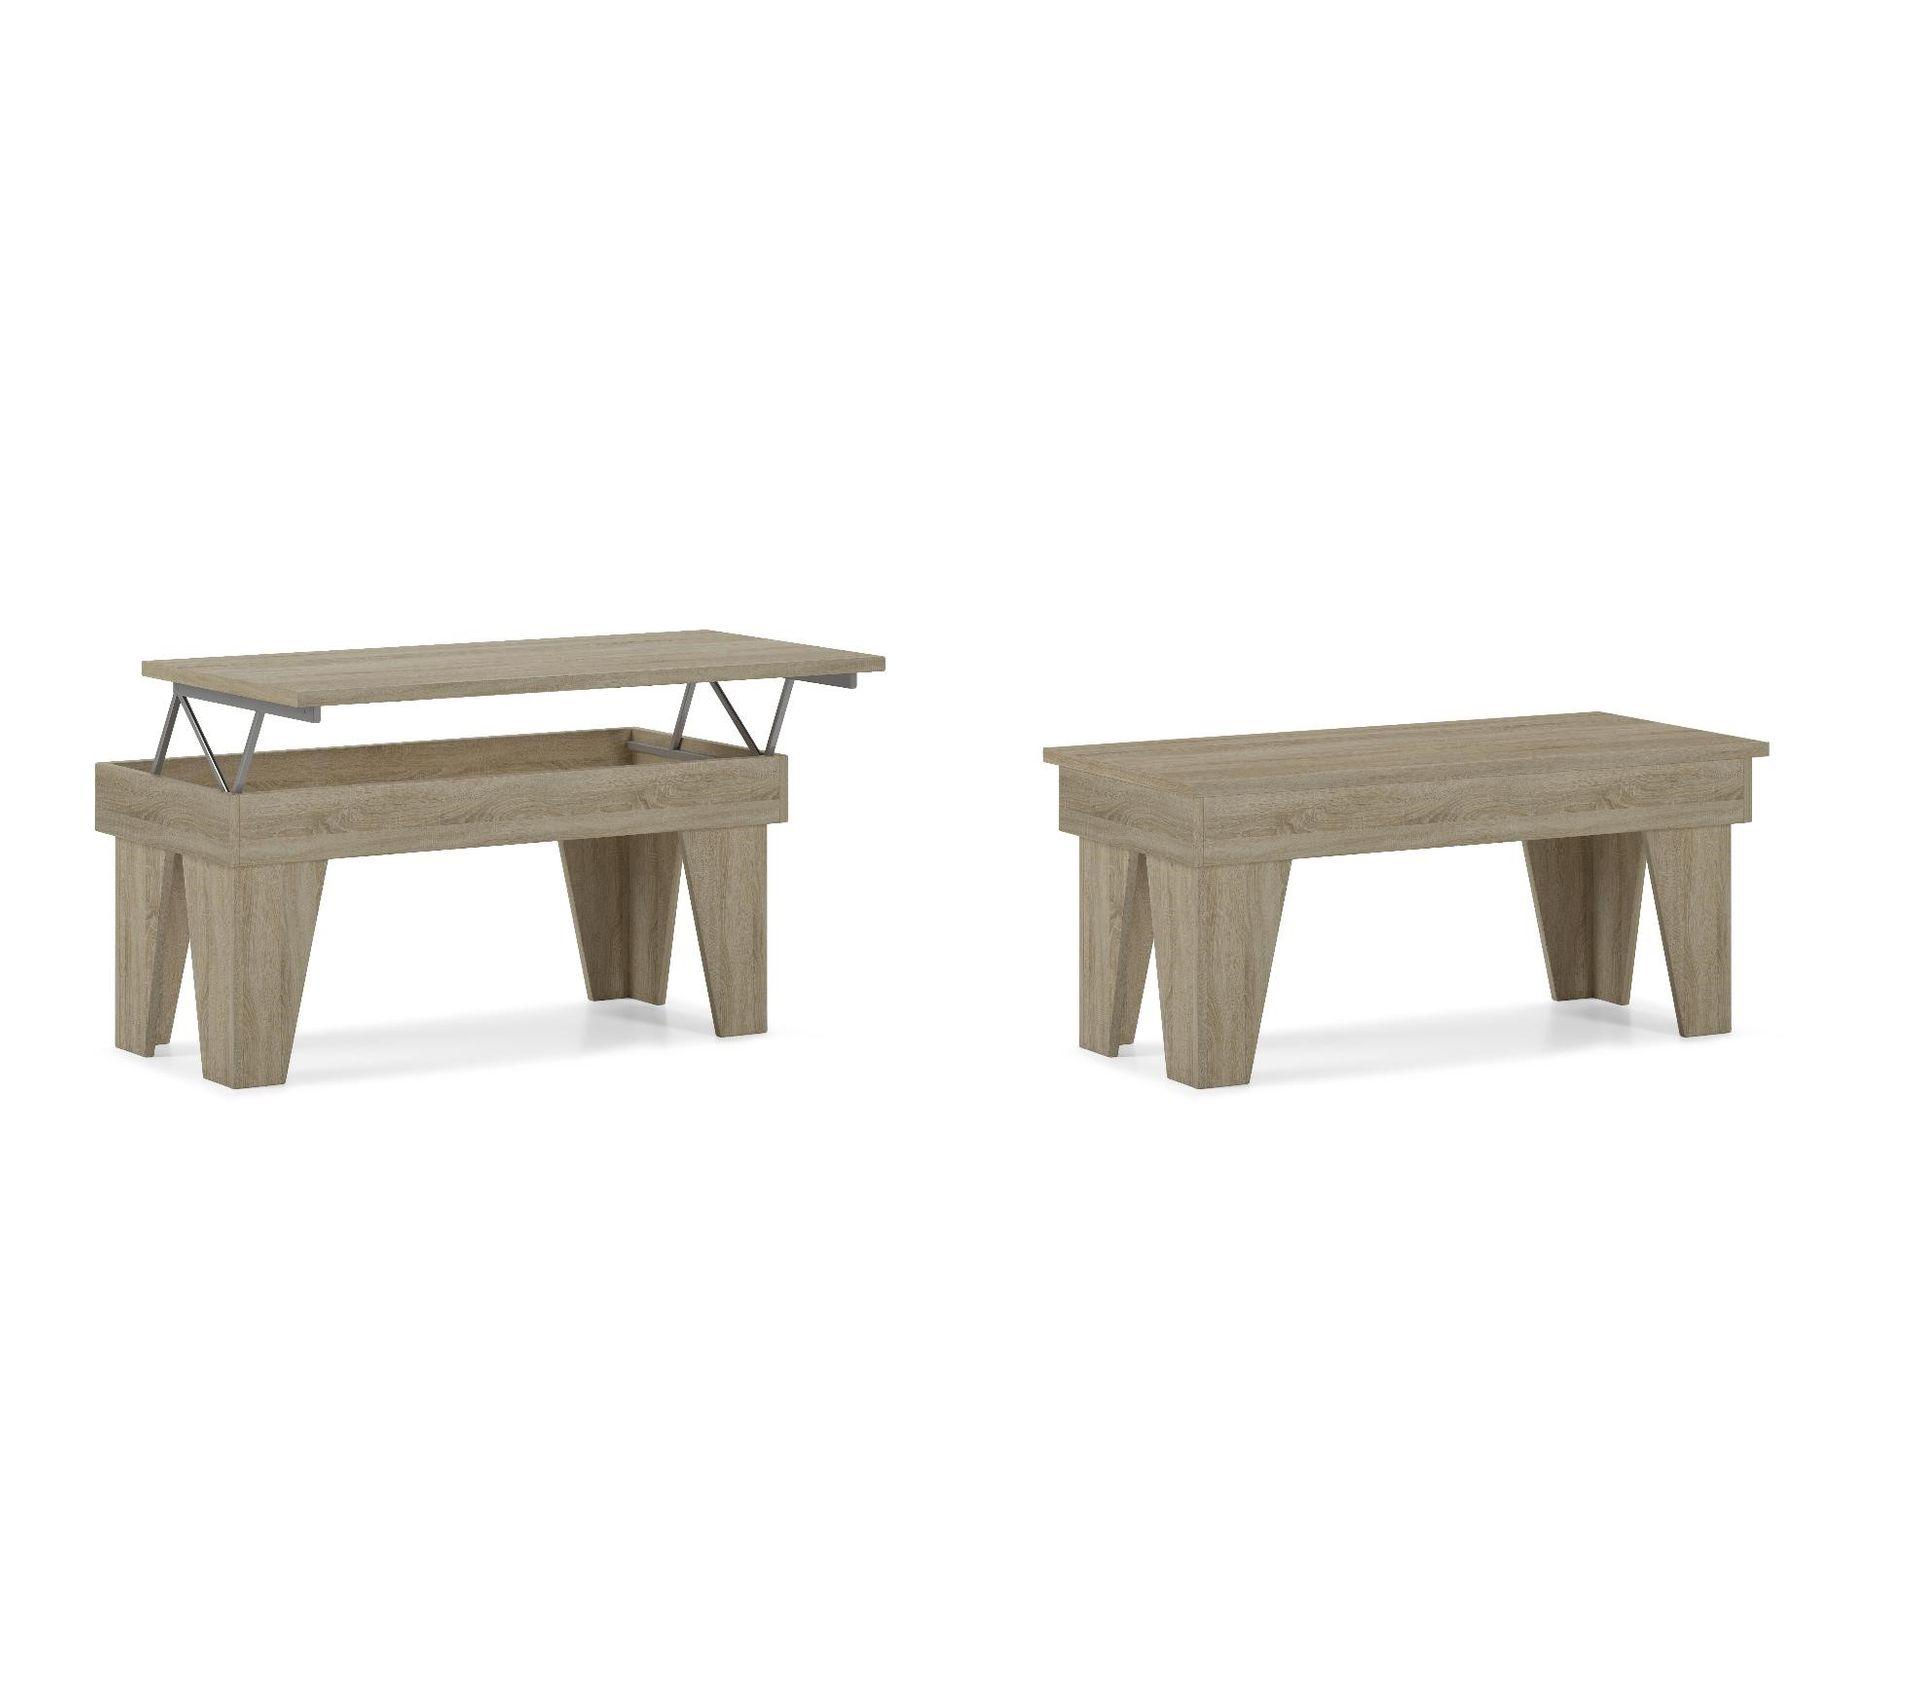 Table Basse Relevable, Kl,chêne Clair